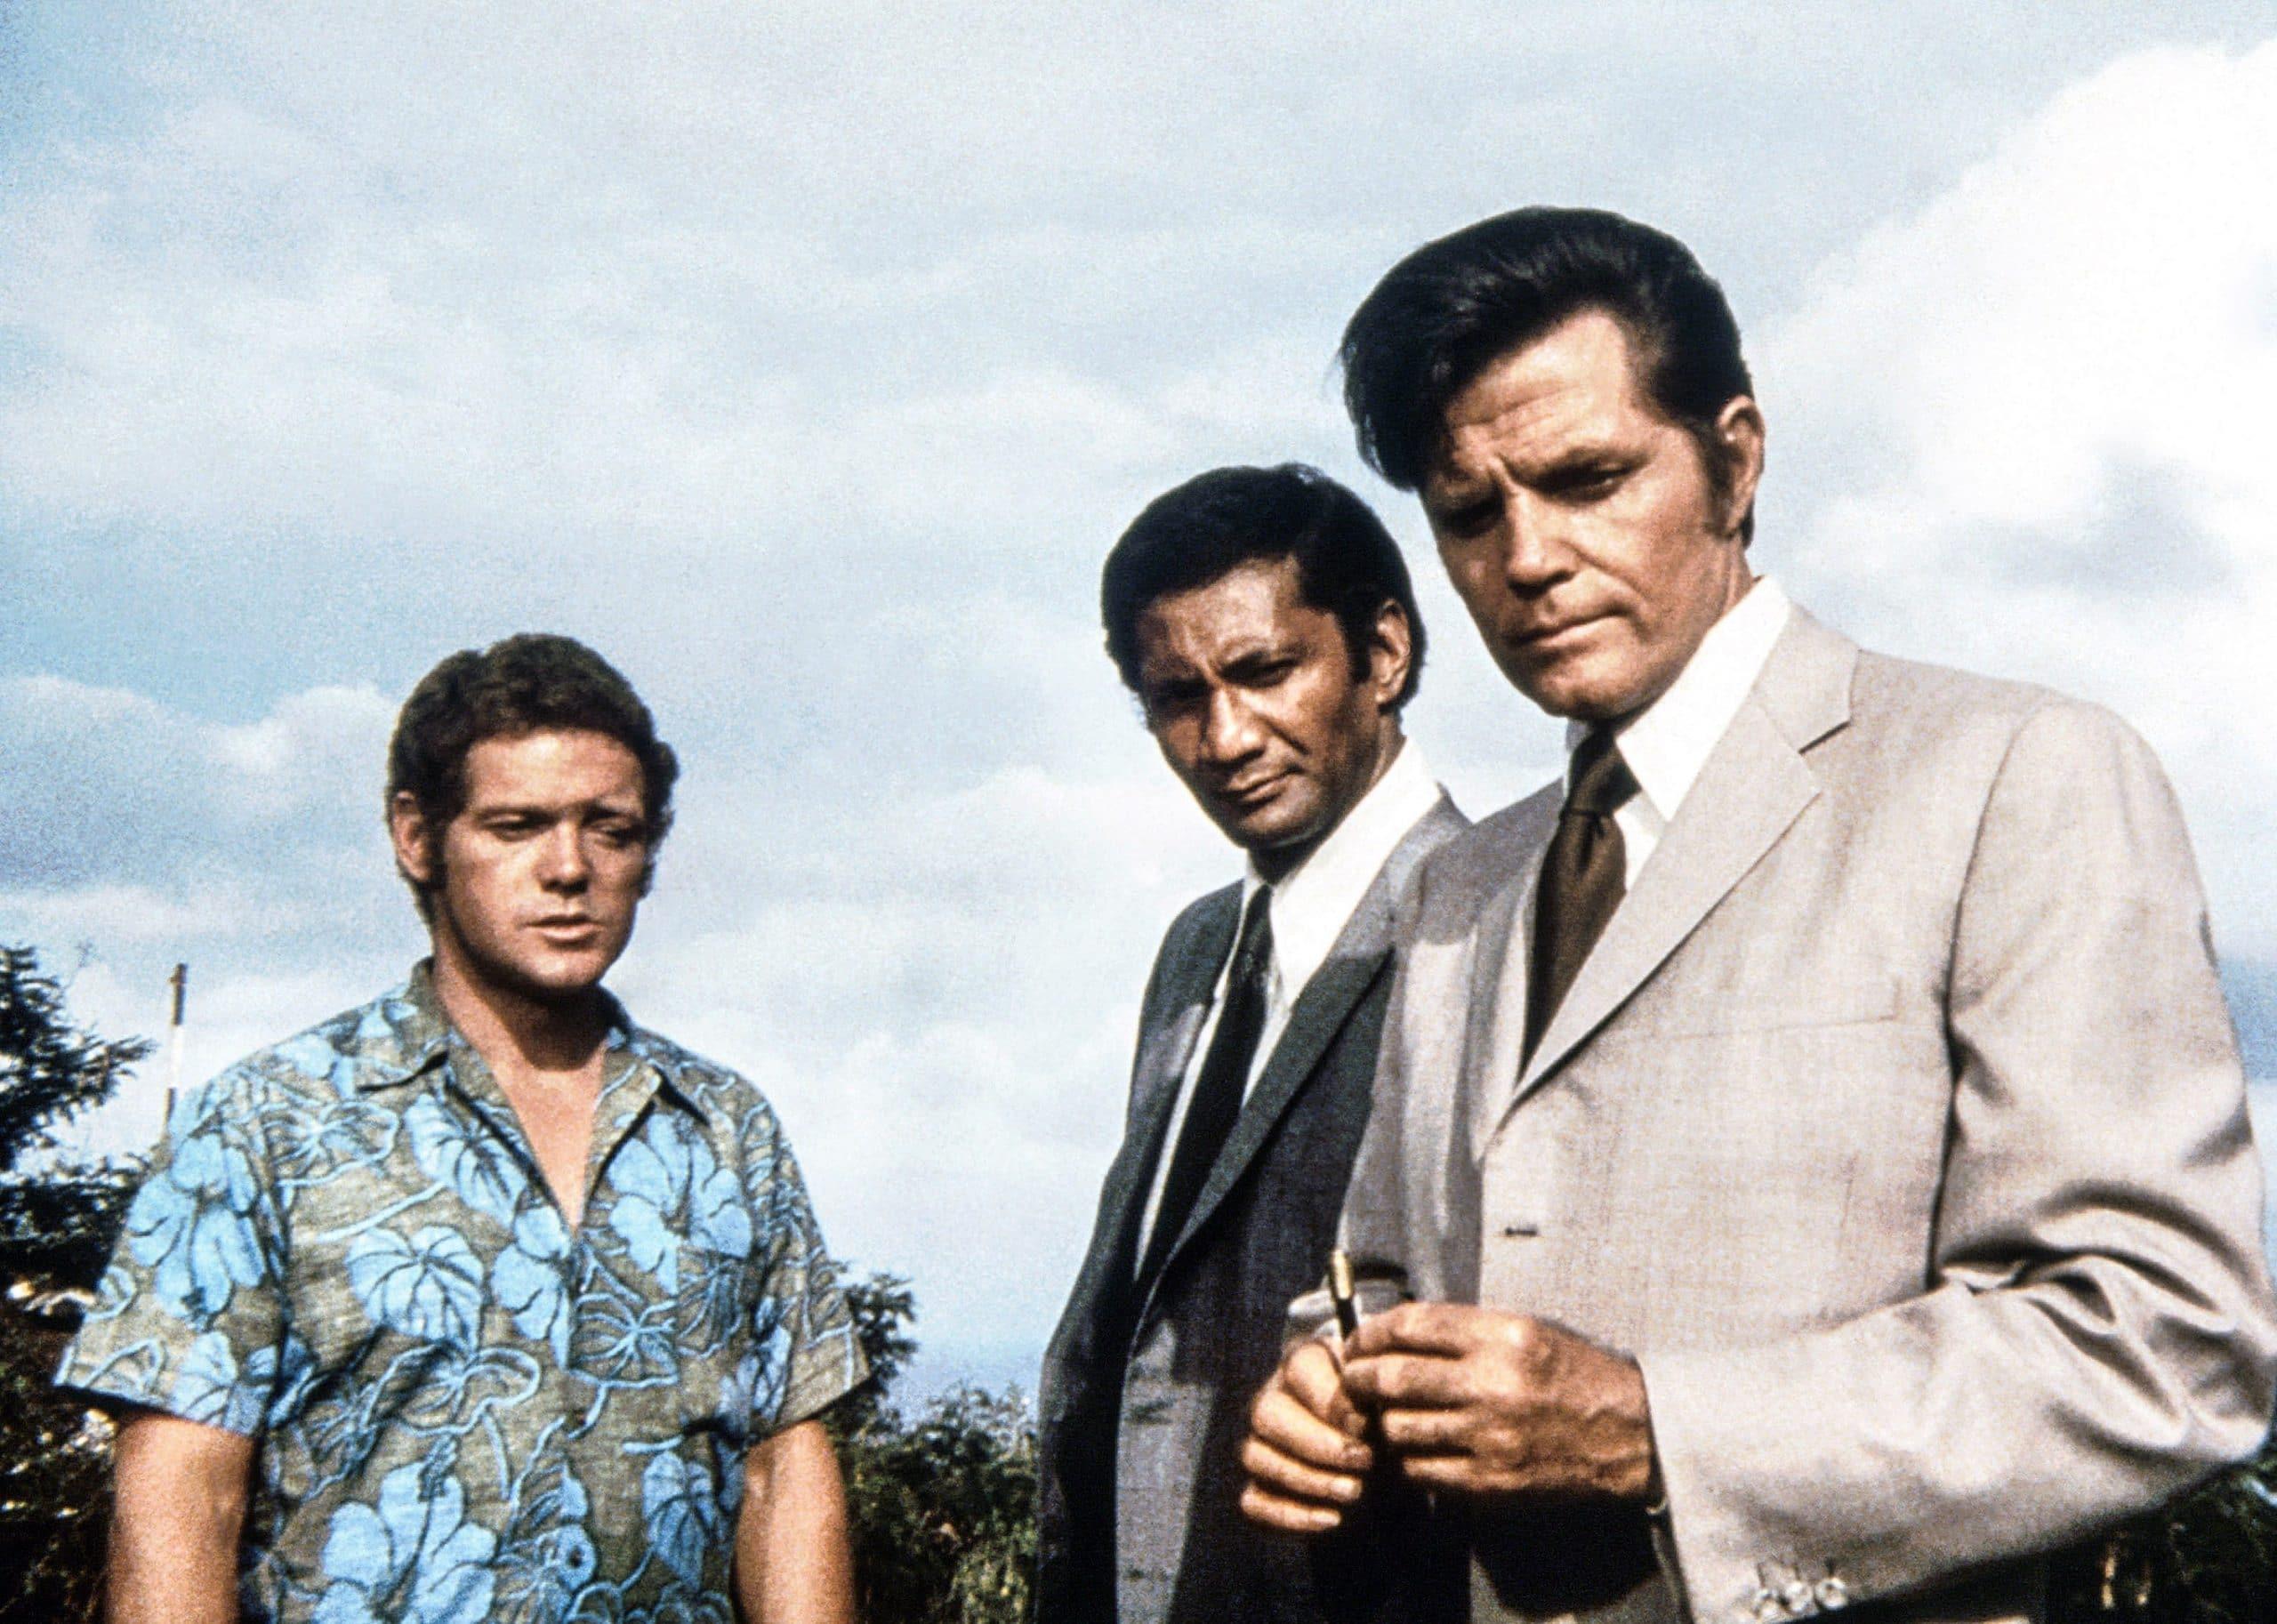 James MacArthur, Al Harrington, Jack Lord